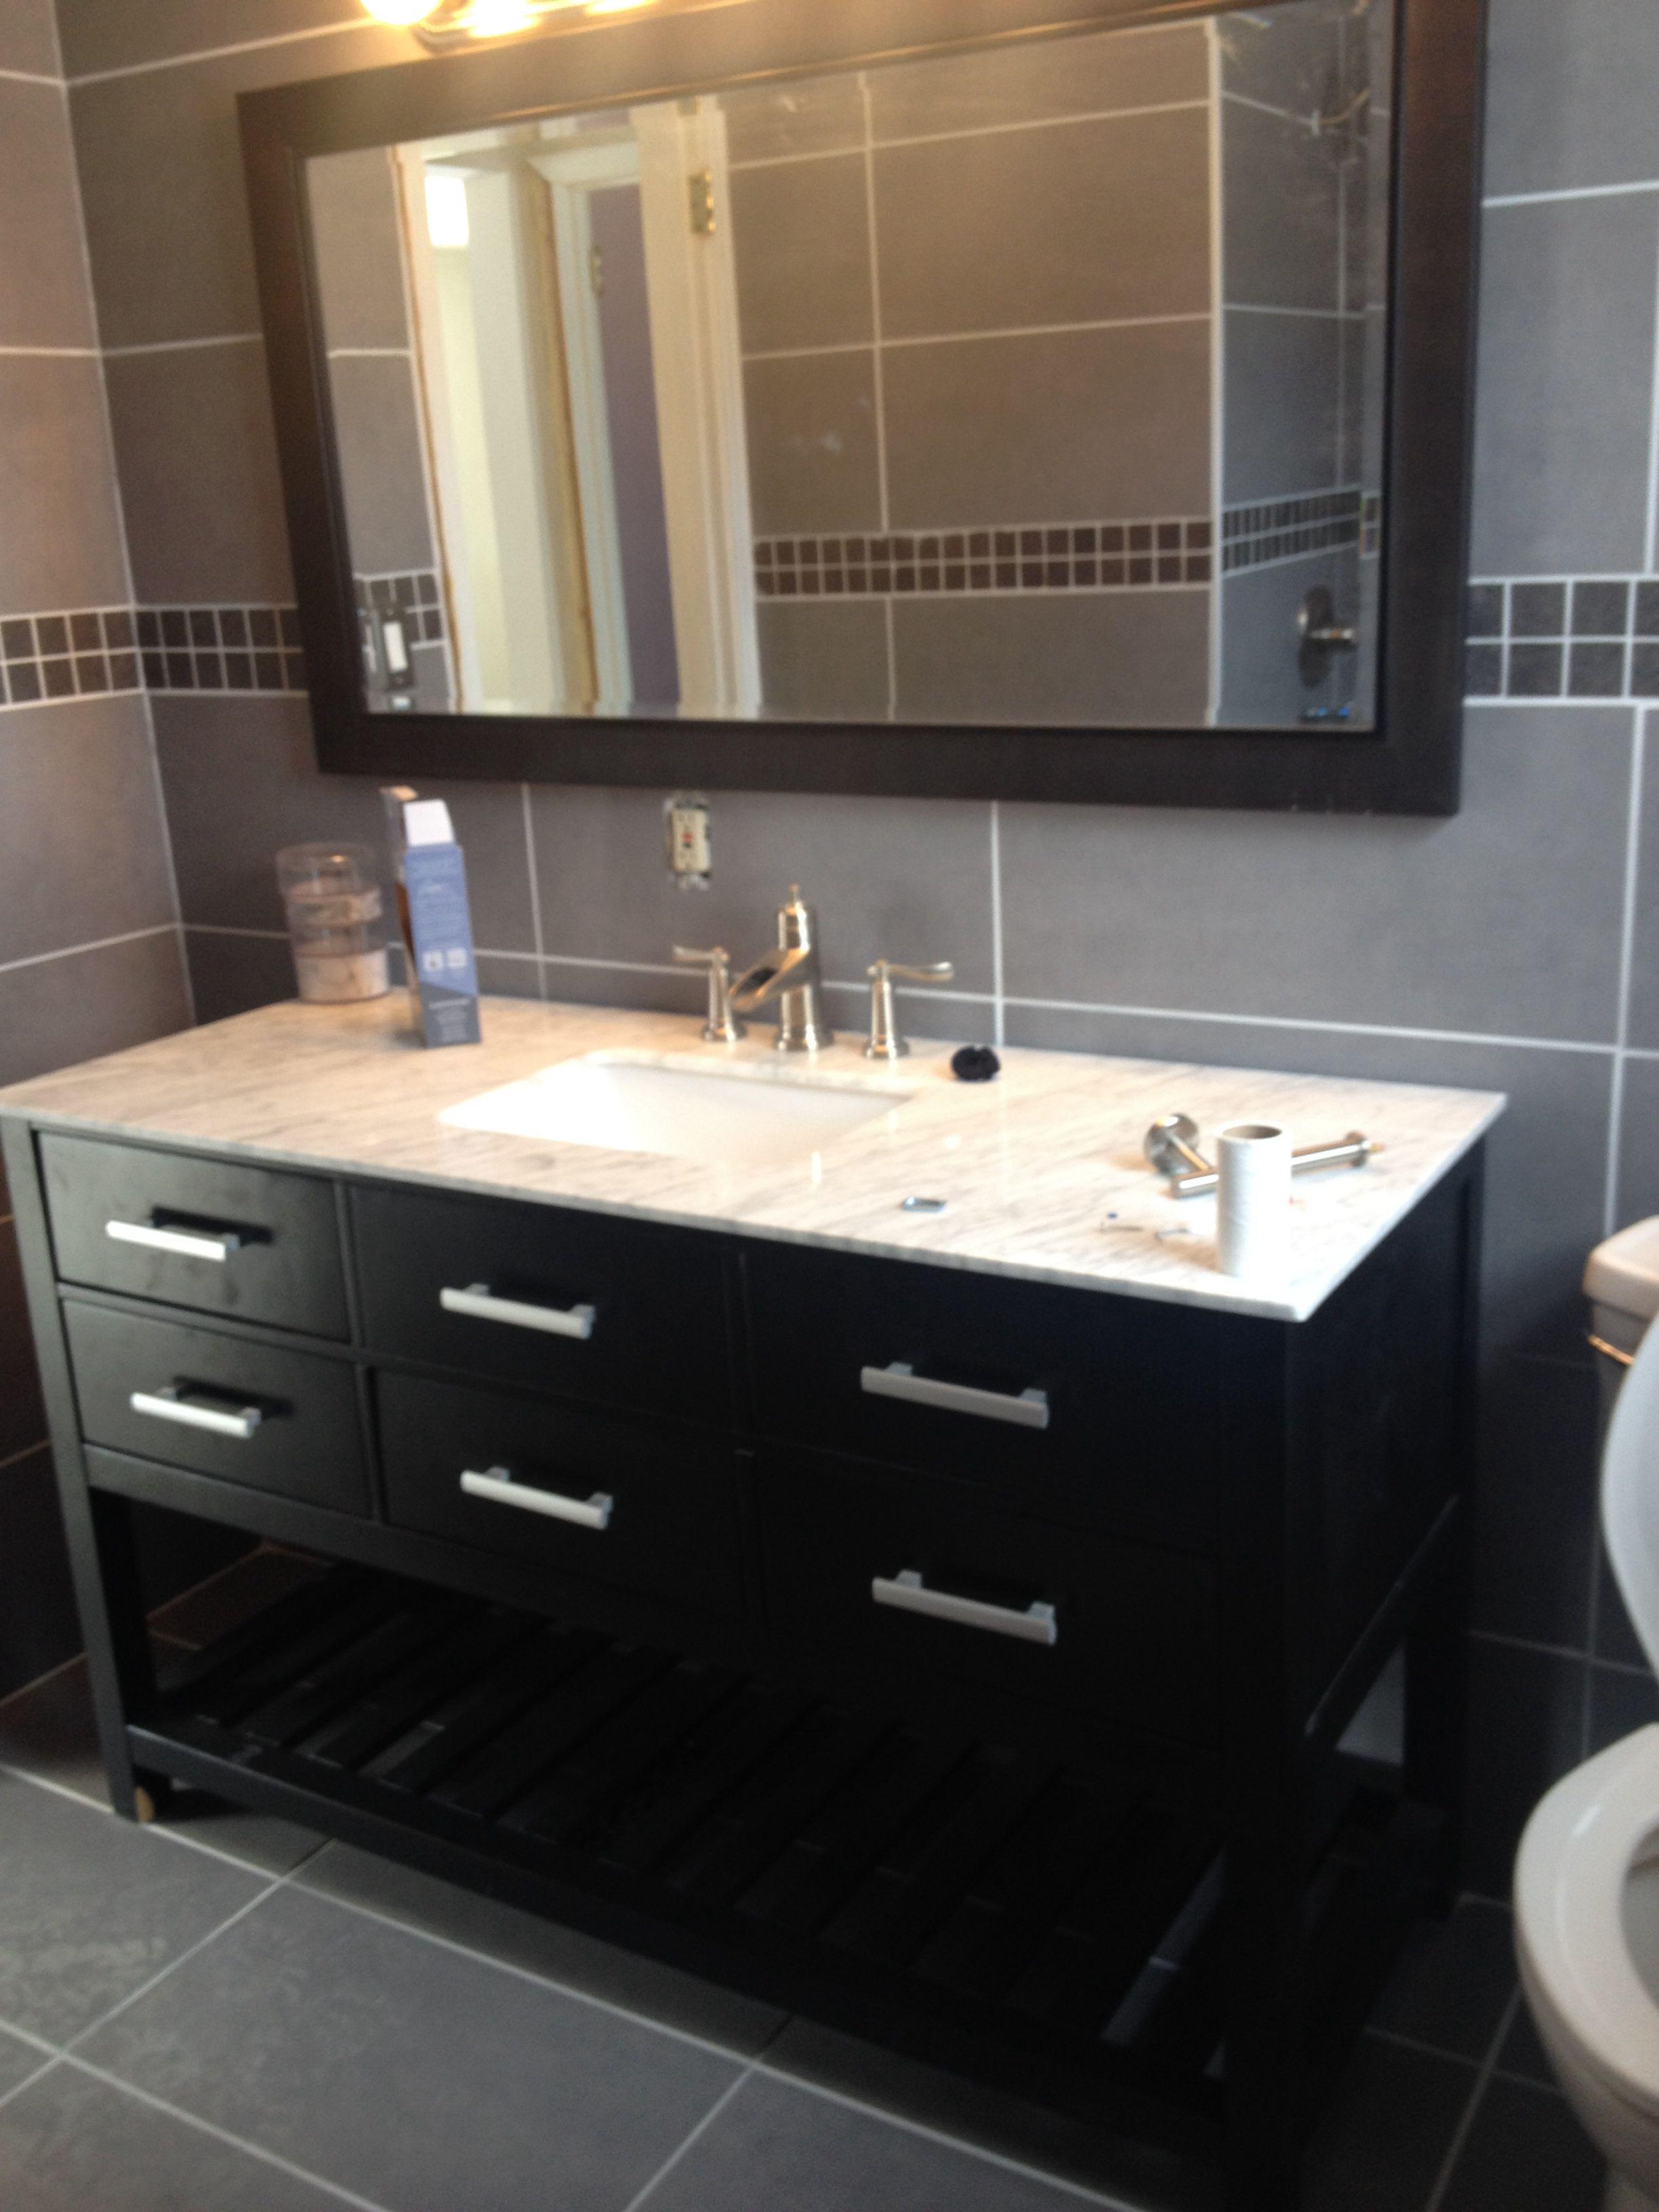 My new bathroom gray ceramic tile from stover - Bathroom vanity liquidation sale ...